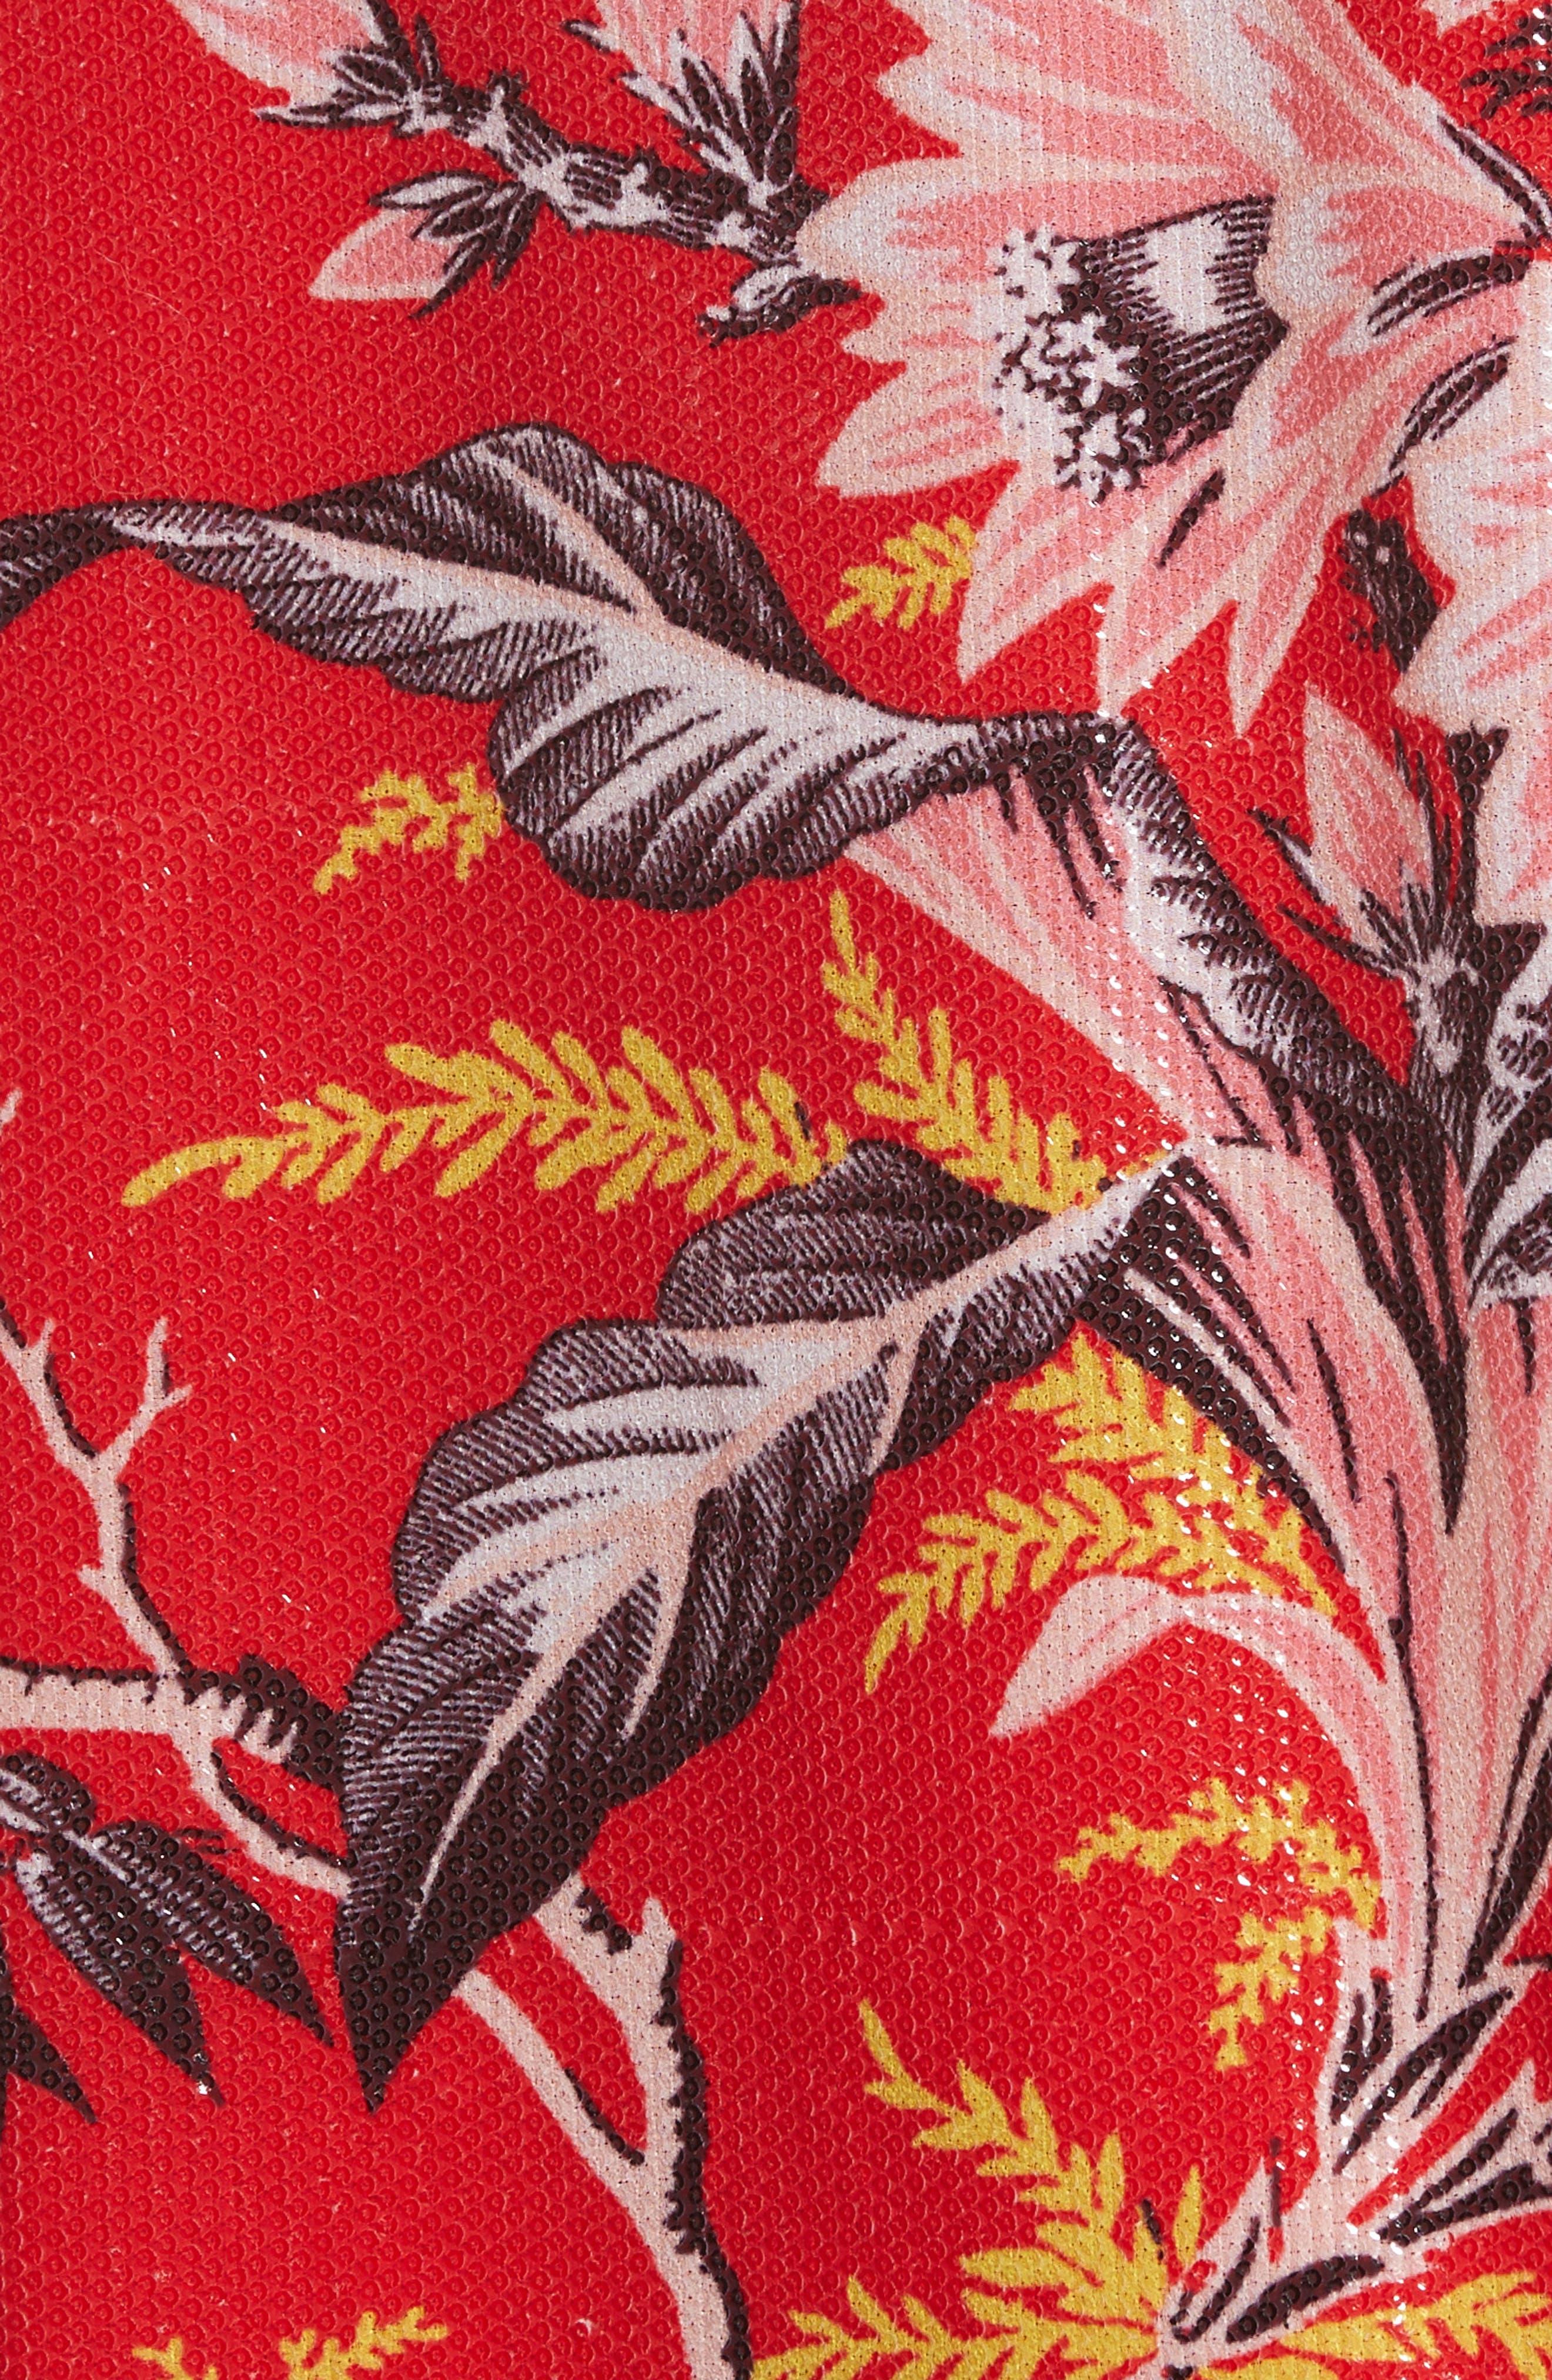 Diane von Furstenberg Fluid Sequin Minidress,                             Alternate thumbnail 5, color,                             Avalon Poppy